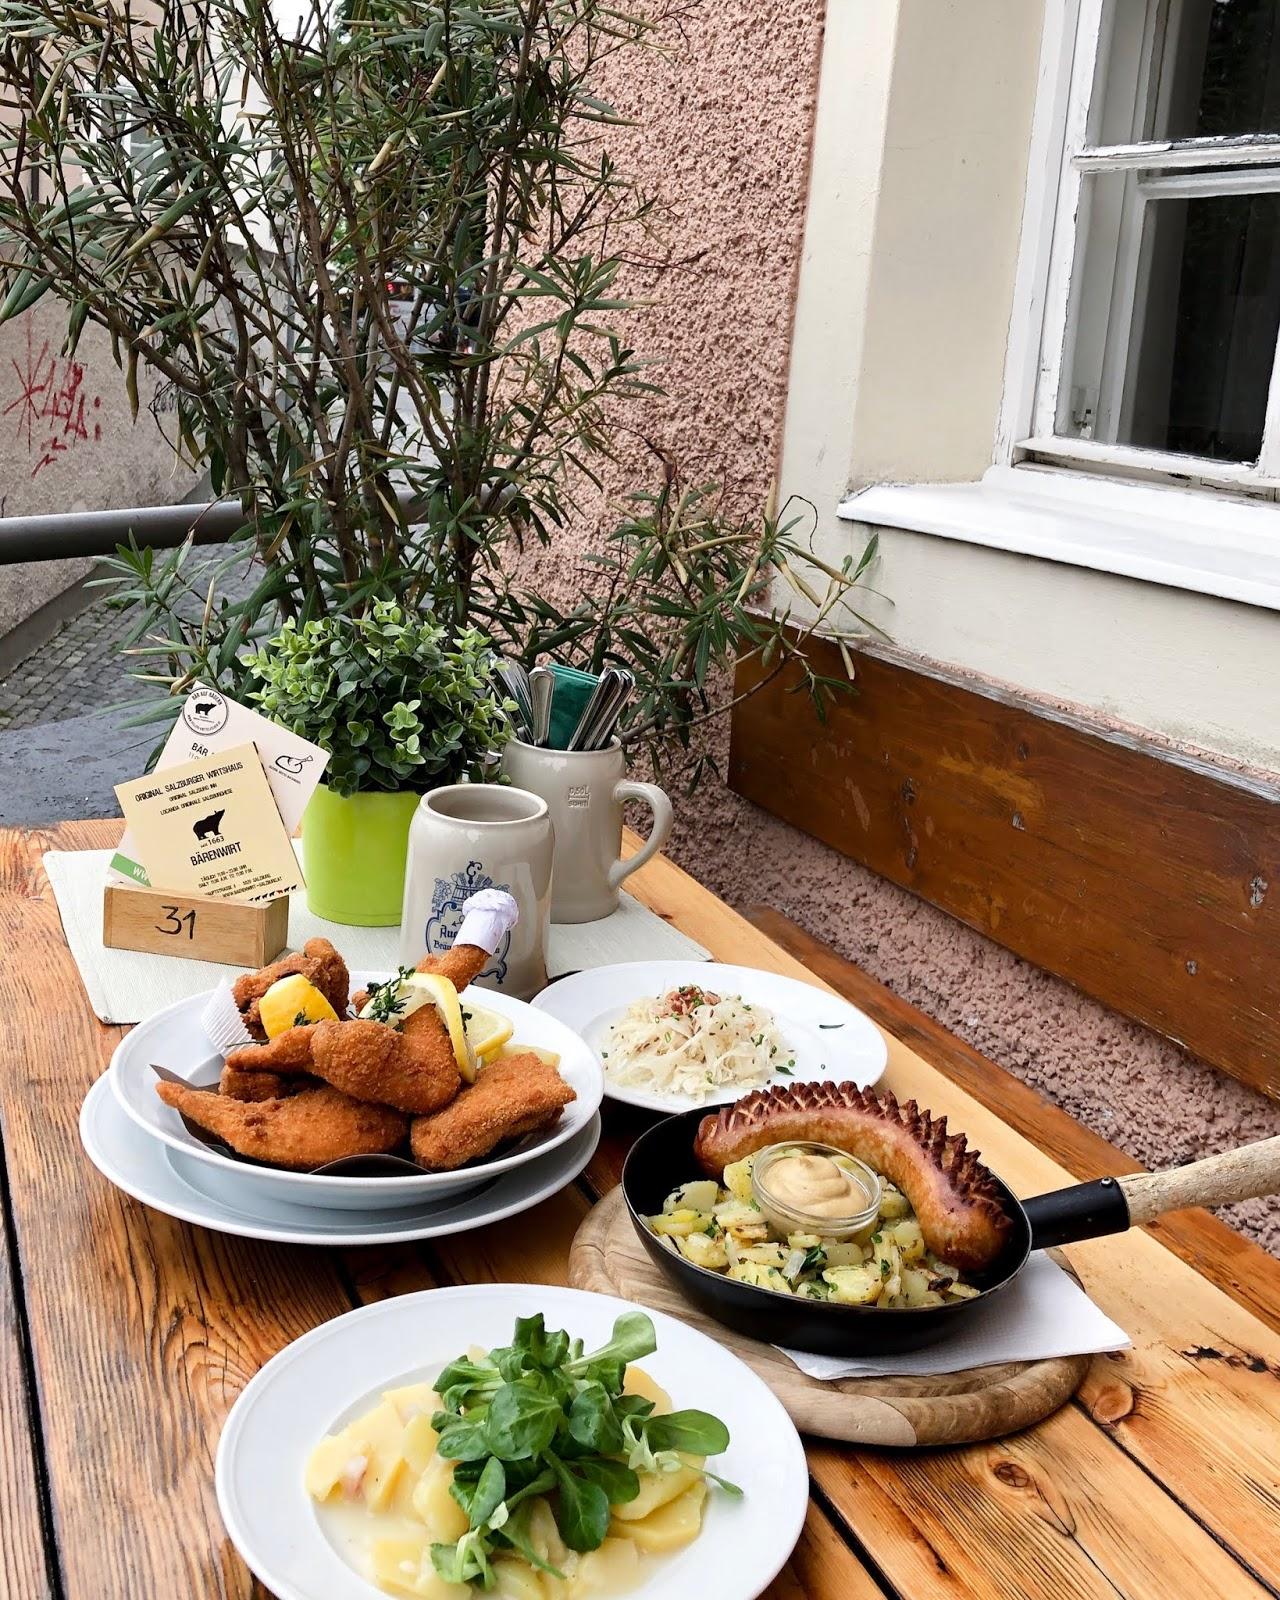 Salzburg Itinerary Barenwit Schnitzel Salzburg itinerary Food to eat